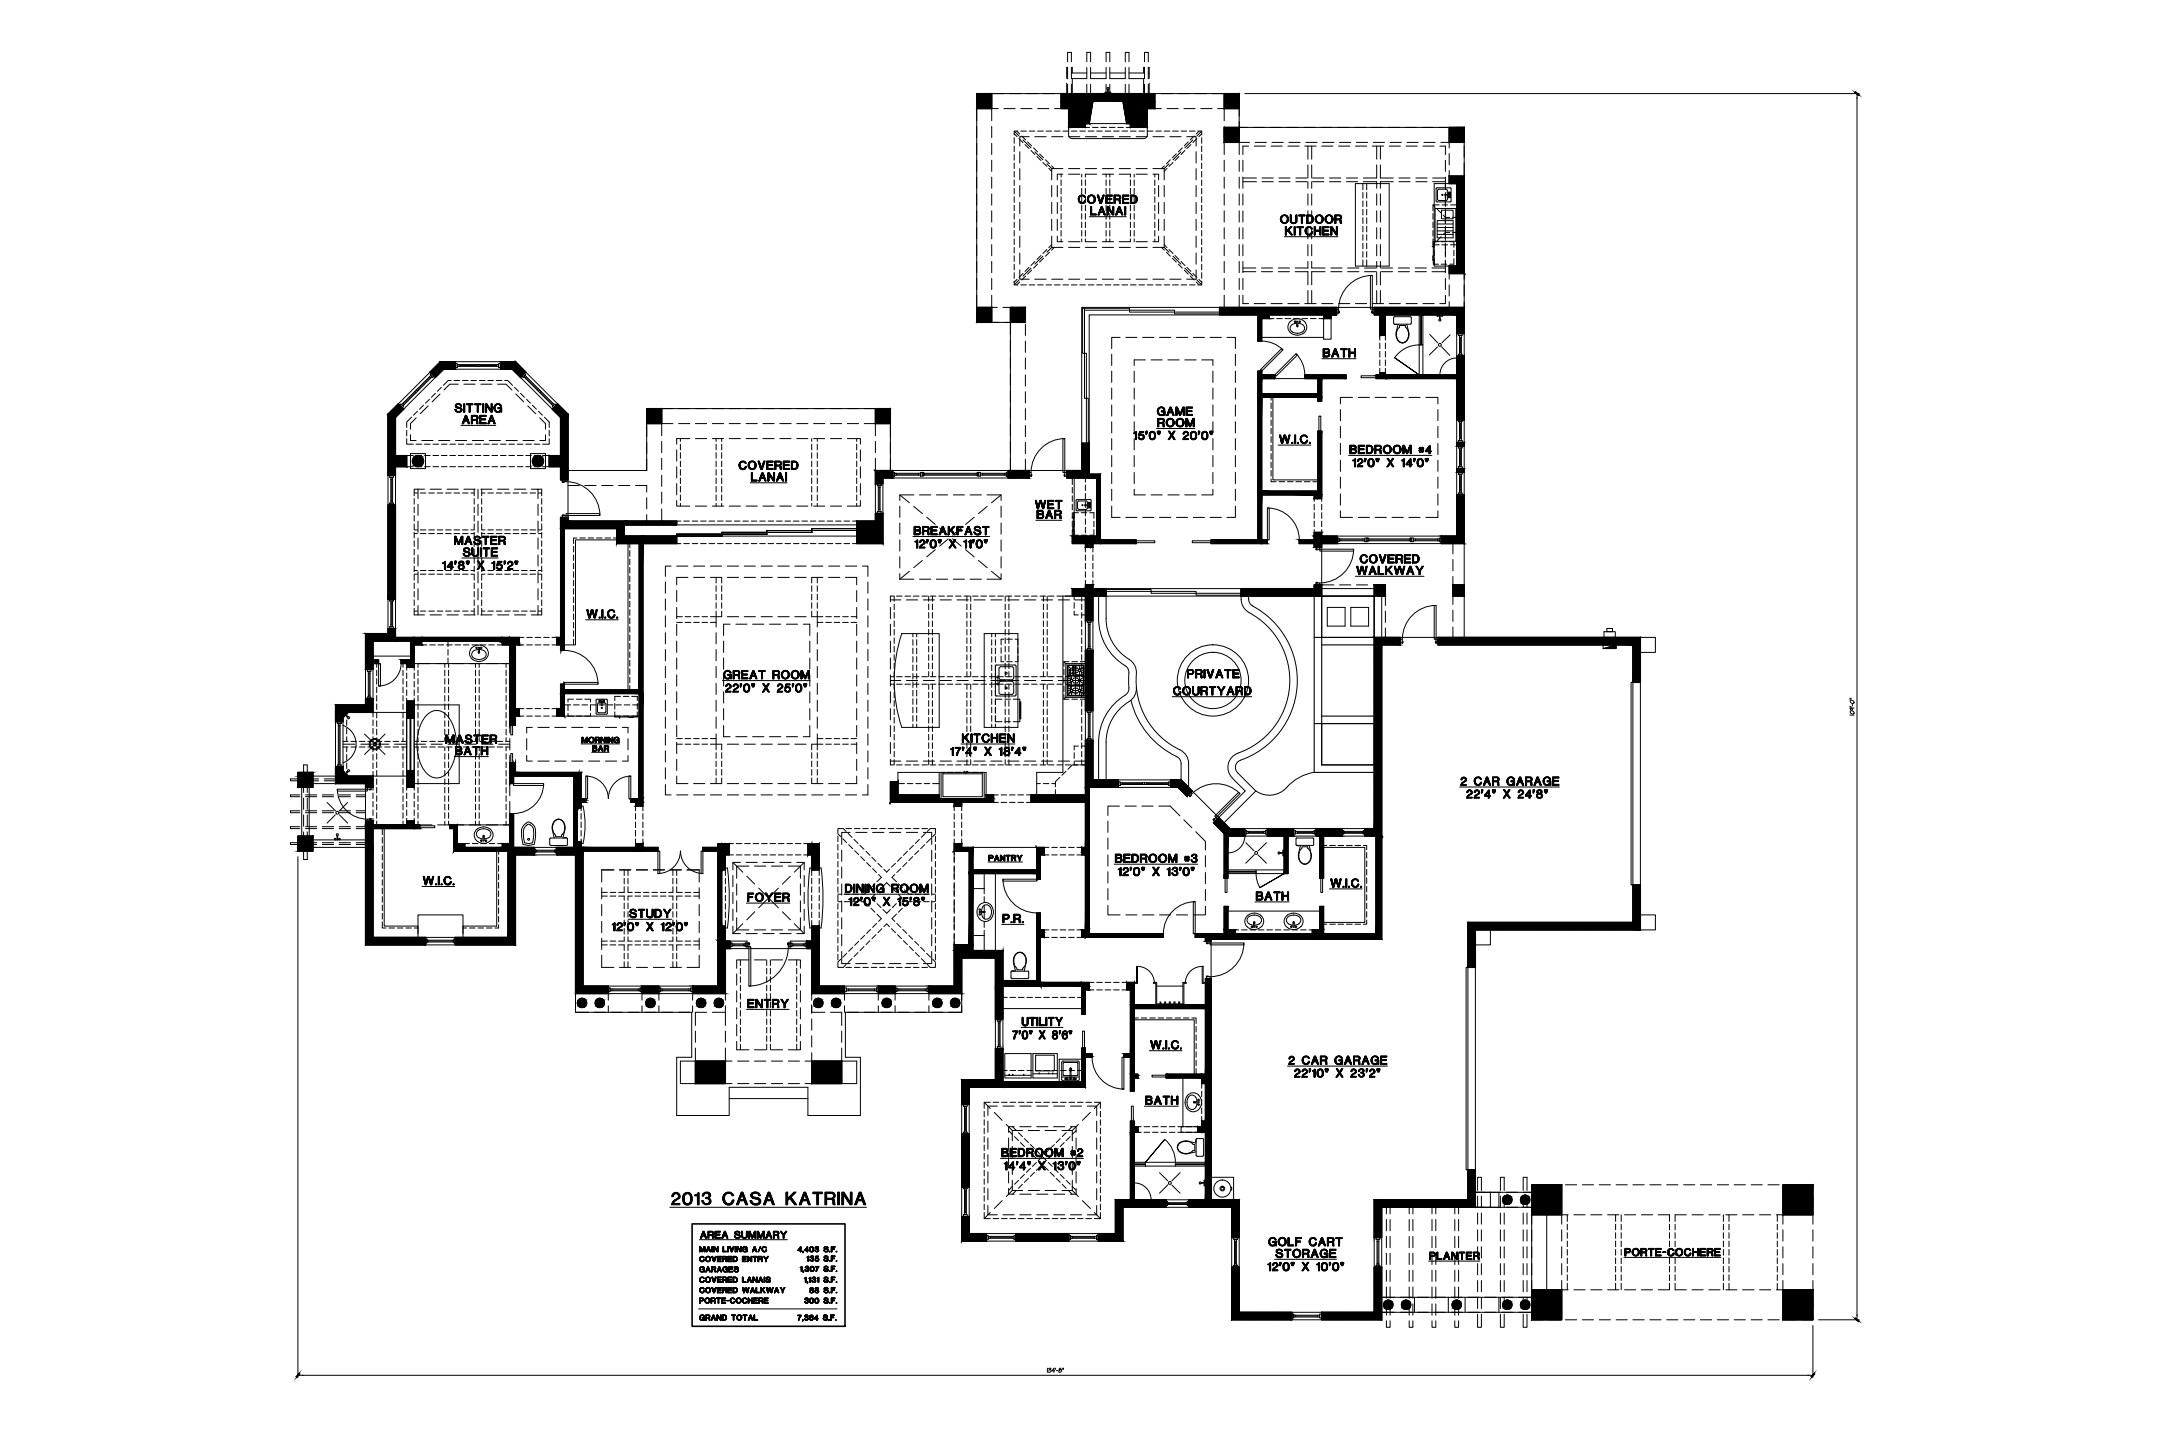 Casa Katrina Floorplan